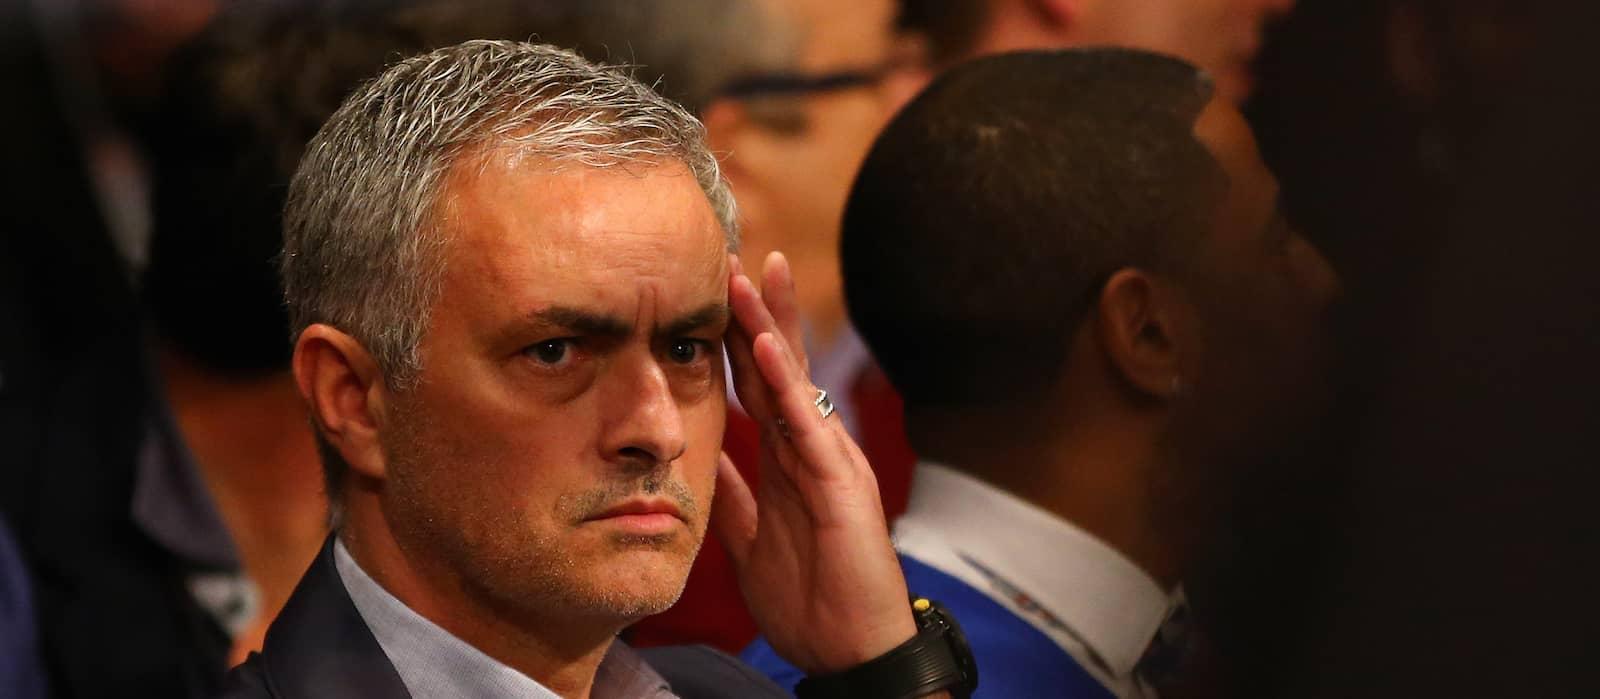 Zlatan Ibrahimovic: Jose Mourinho is the right man for Man United